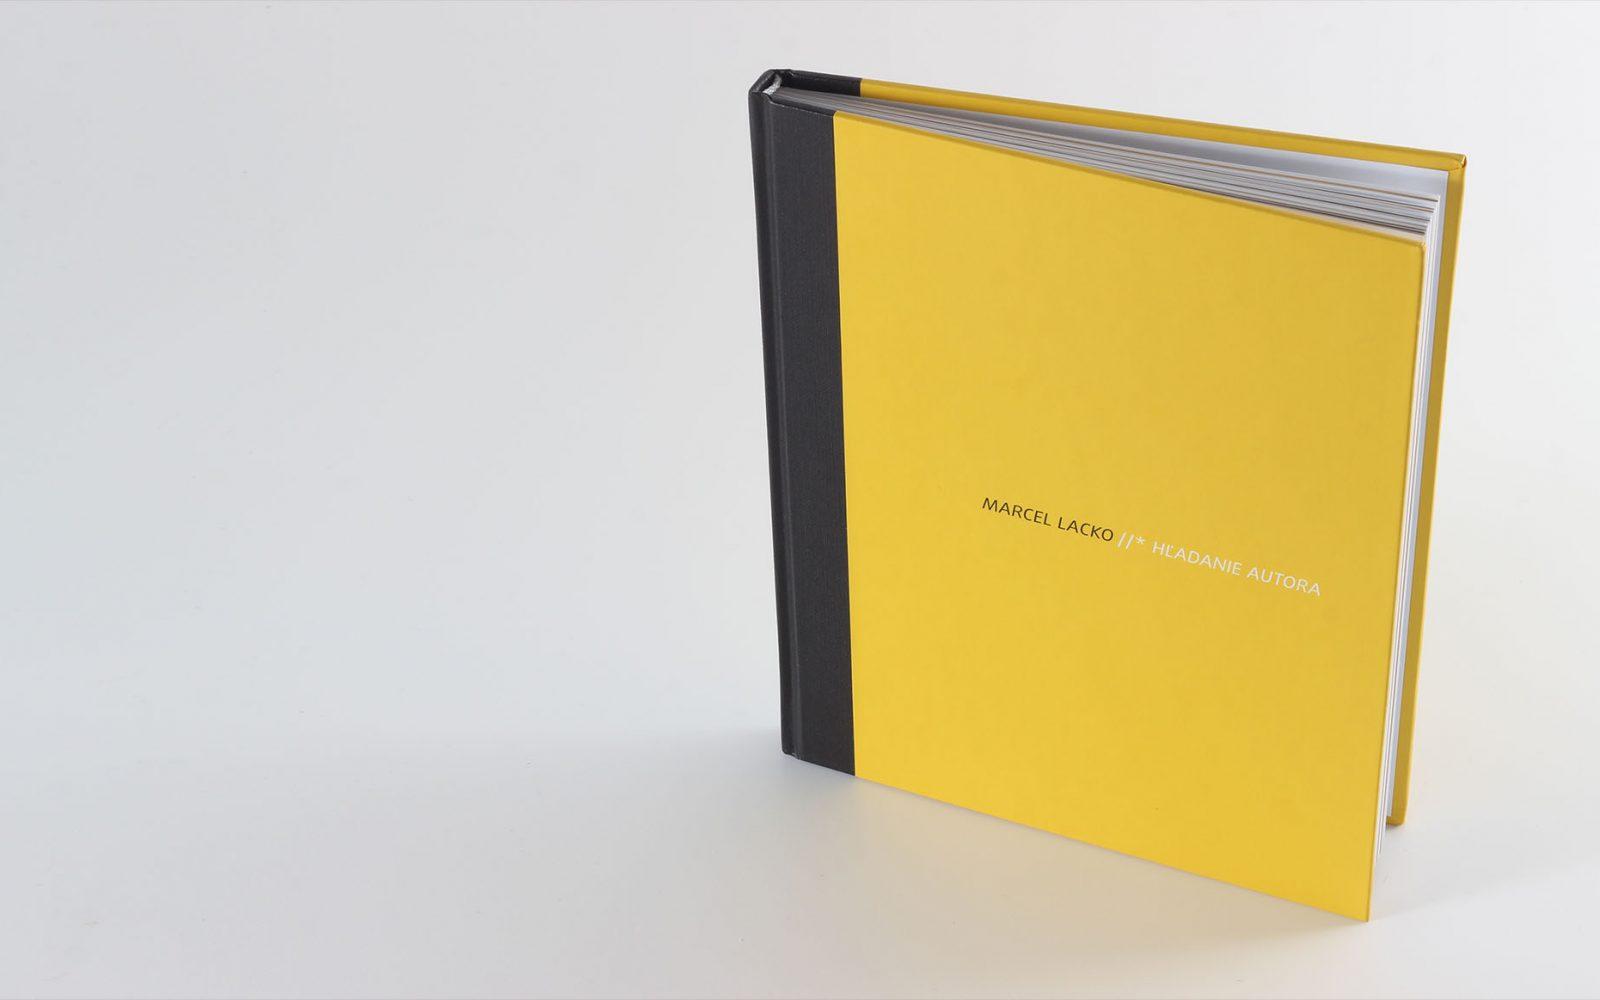 marcel-lacko-kniha-1